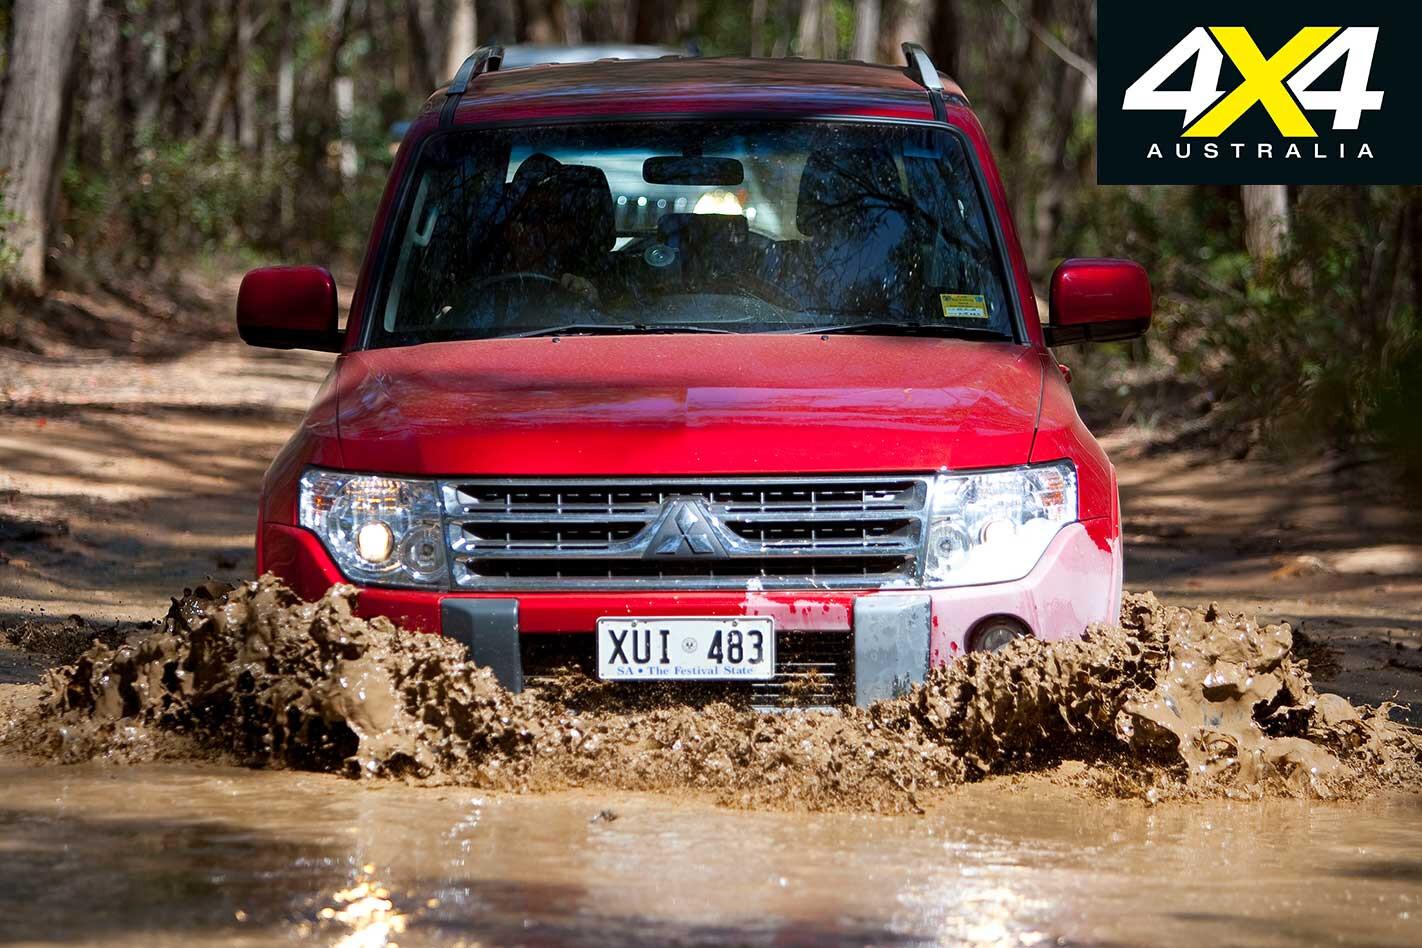 2009 Mitsubishi Pajero Mud Crossing Jpg